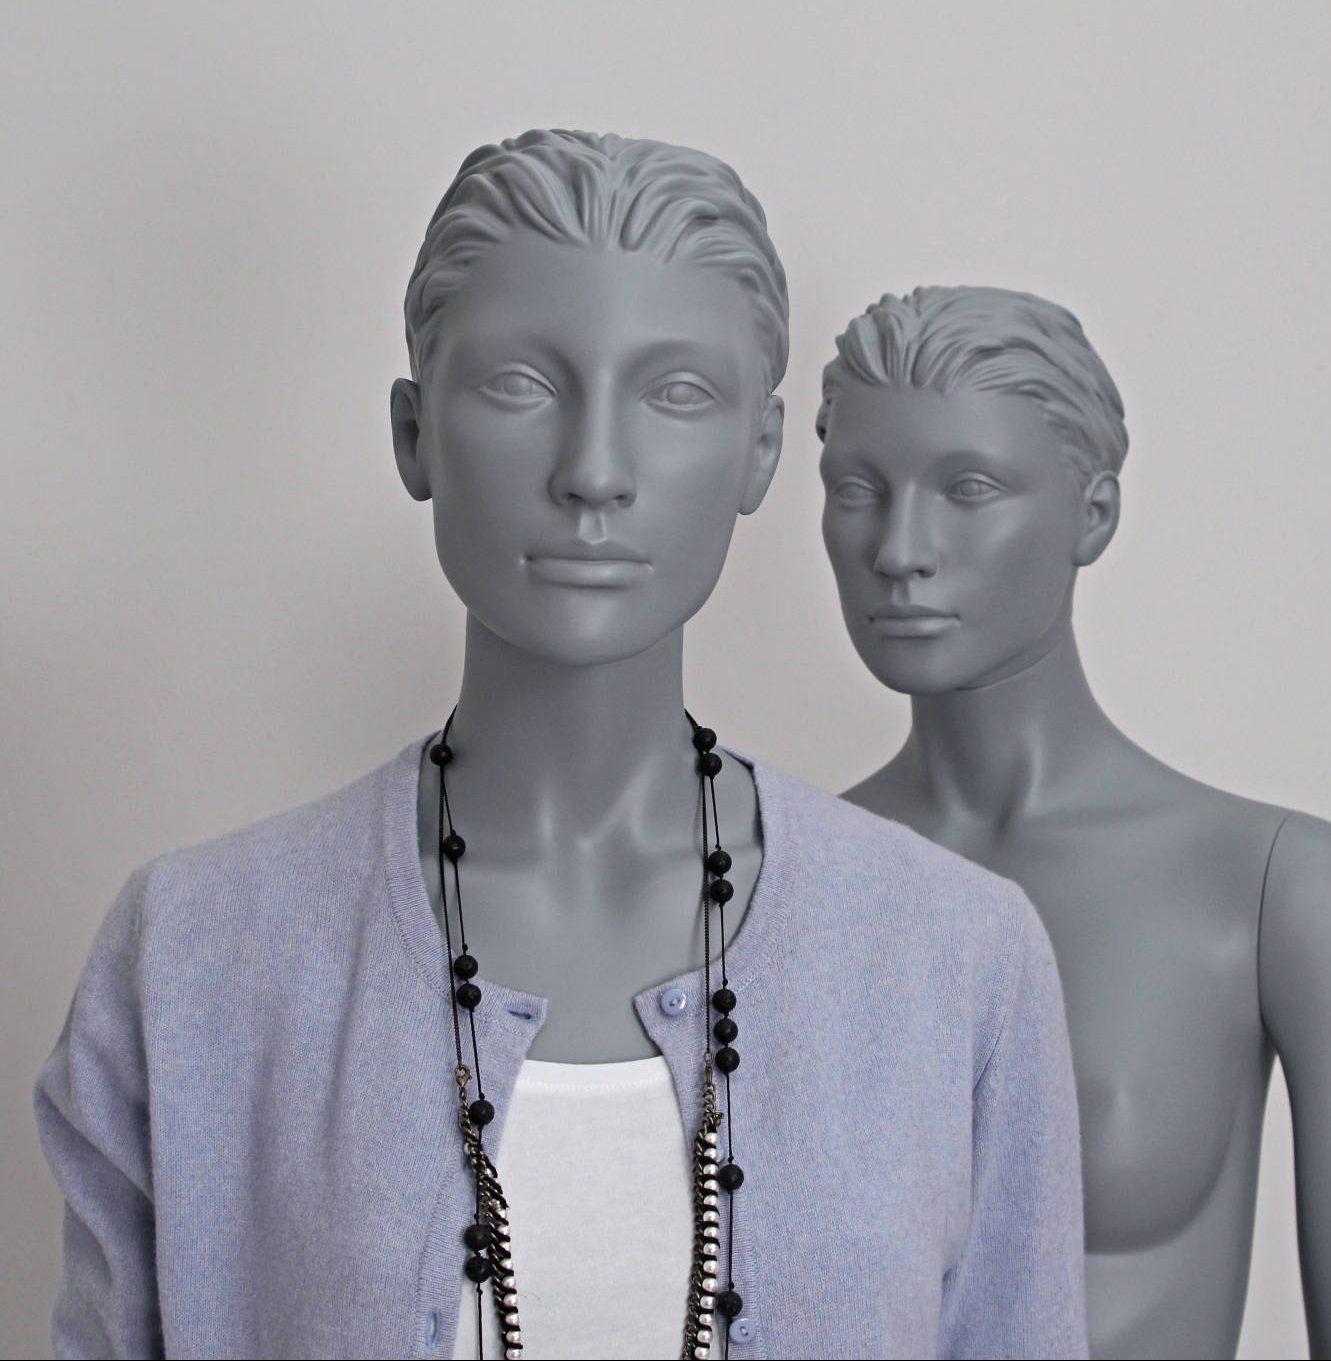 modegrå stilistisk dame mannequin. sporty look. ungdommelig.